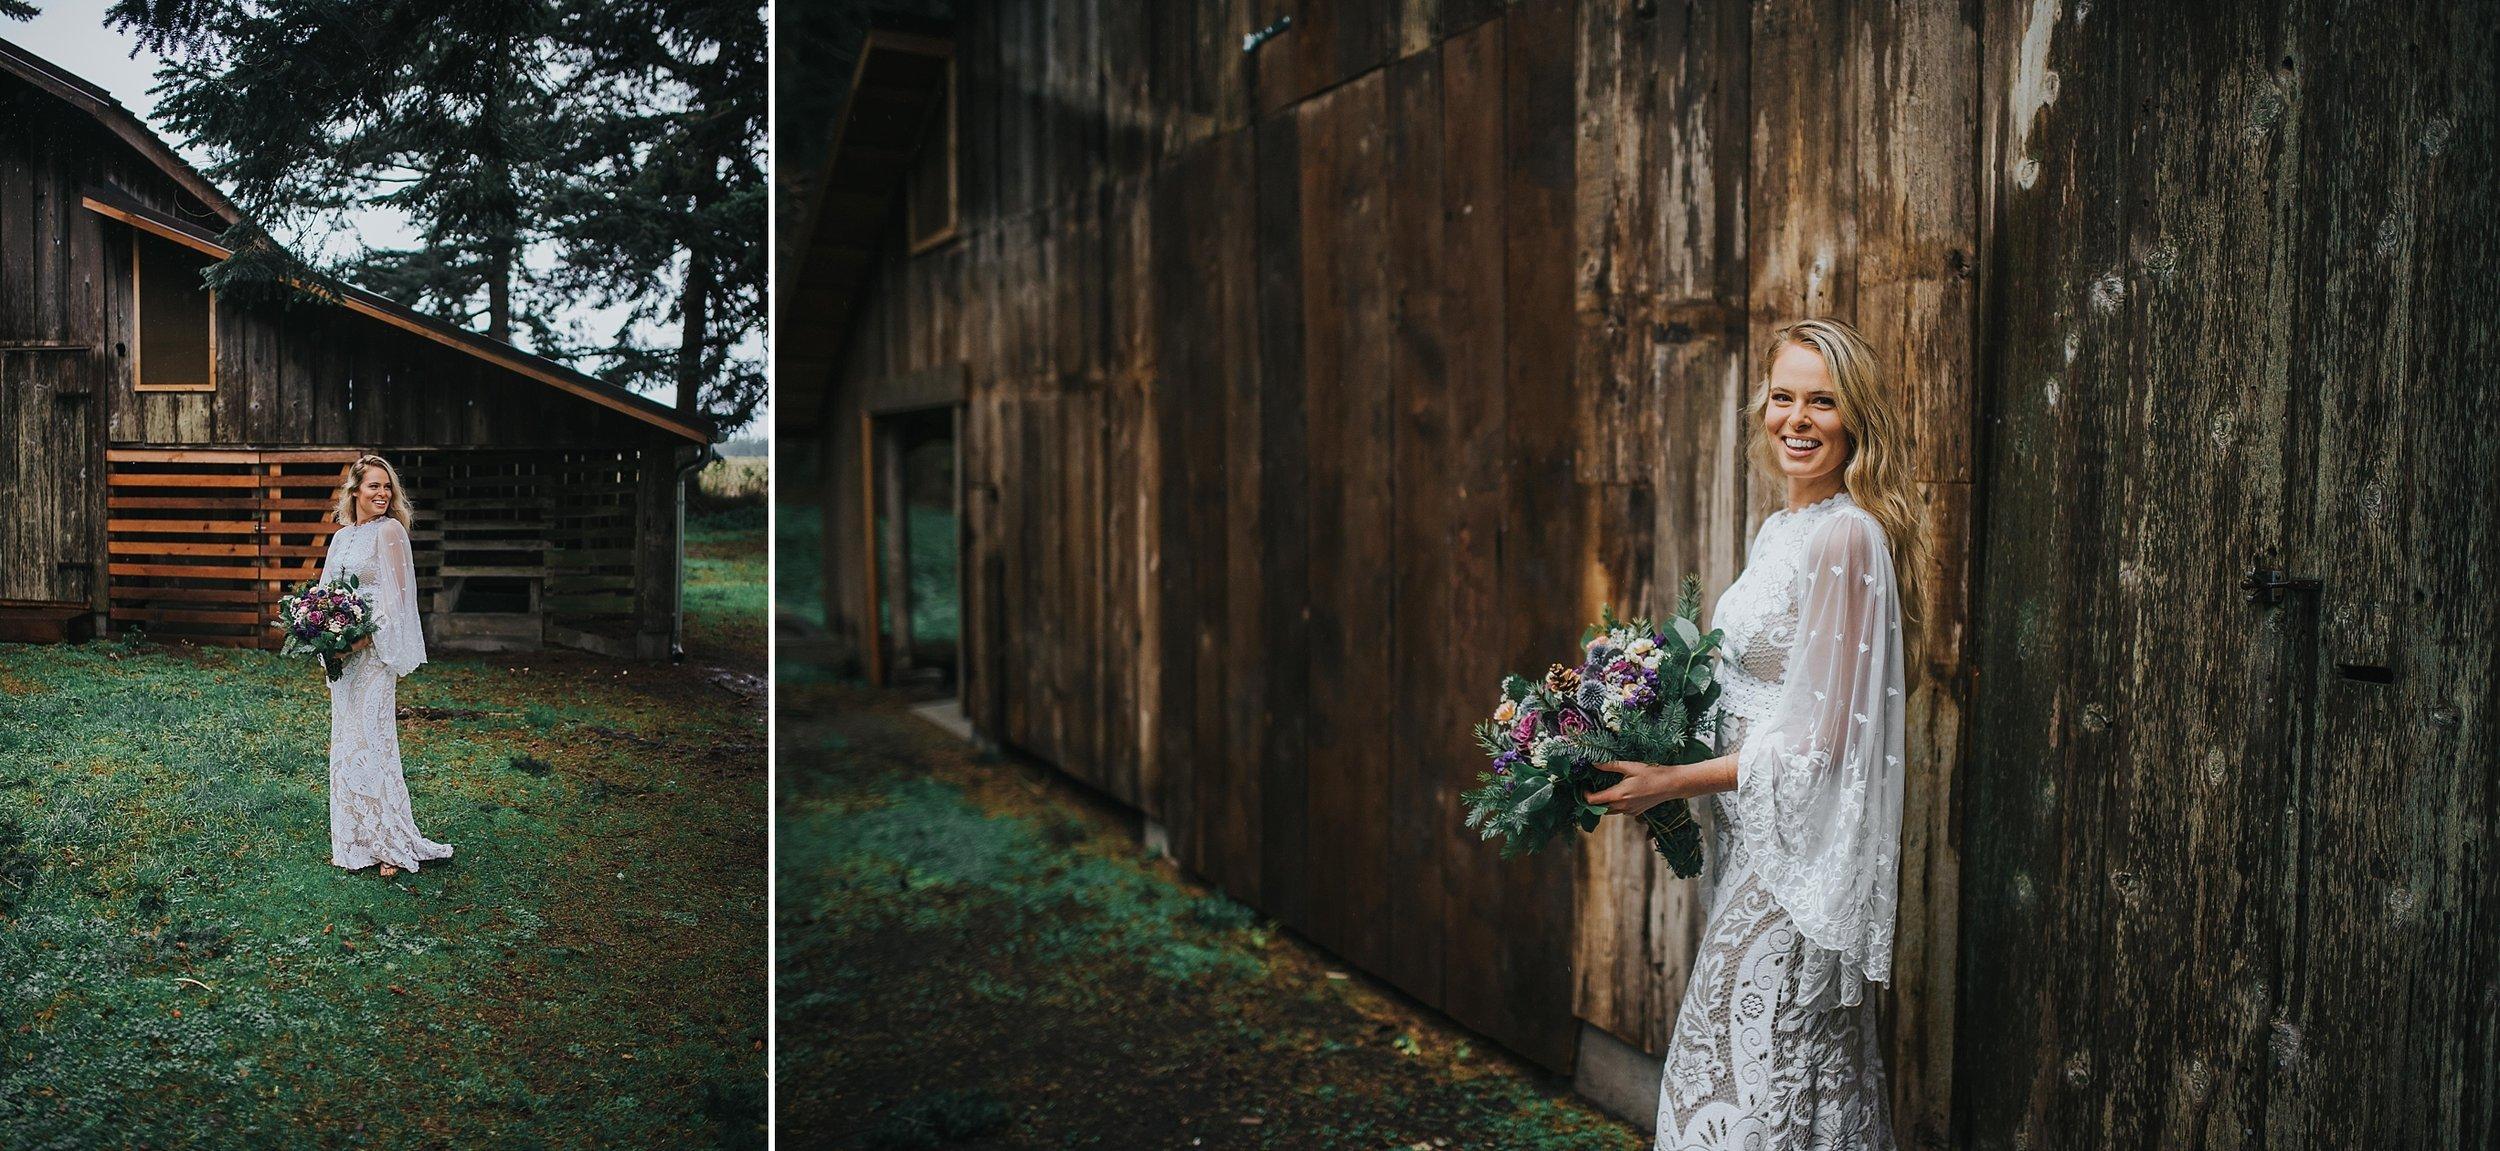 Wedding-photographer-J HODGES PHOTOGRAPHY_0213.jpg